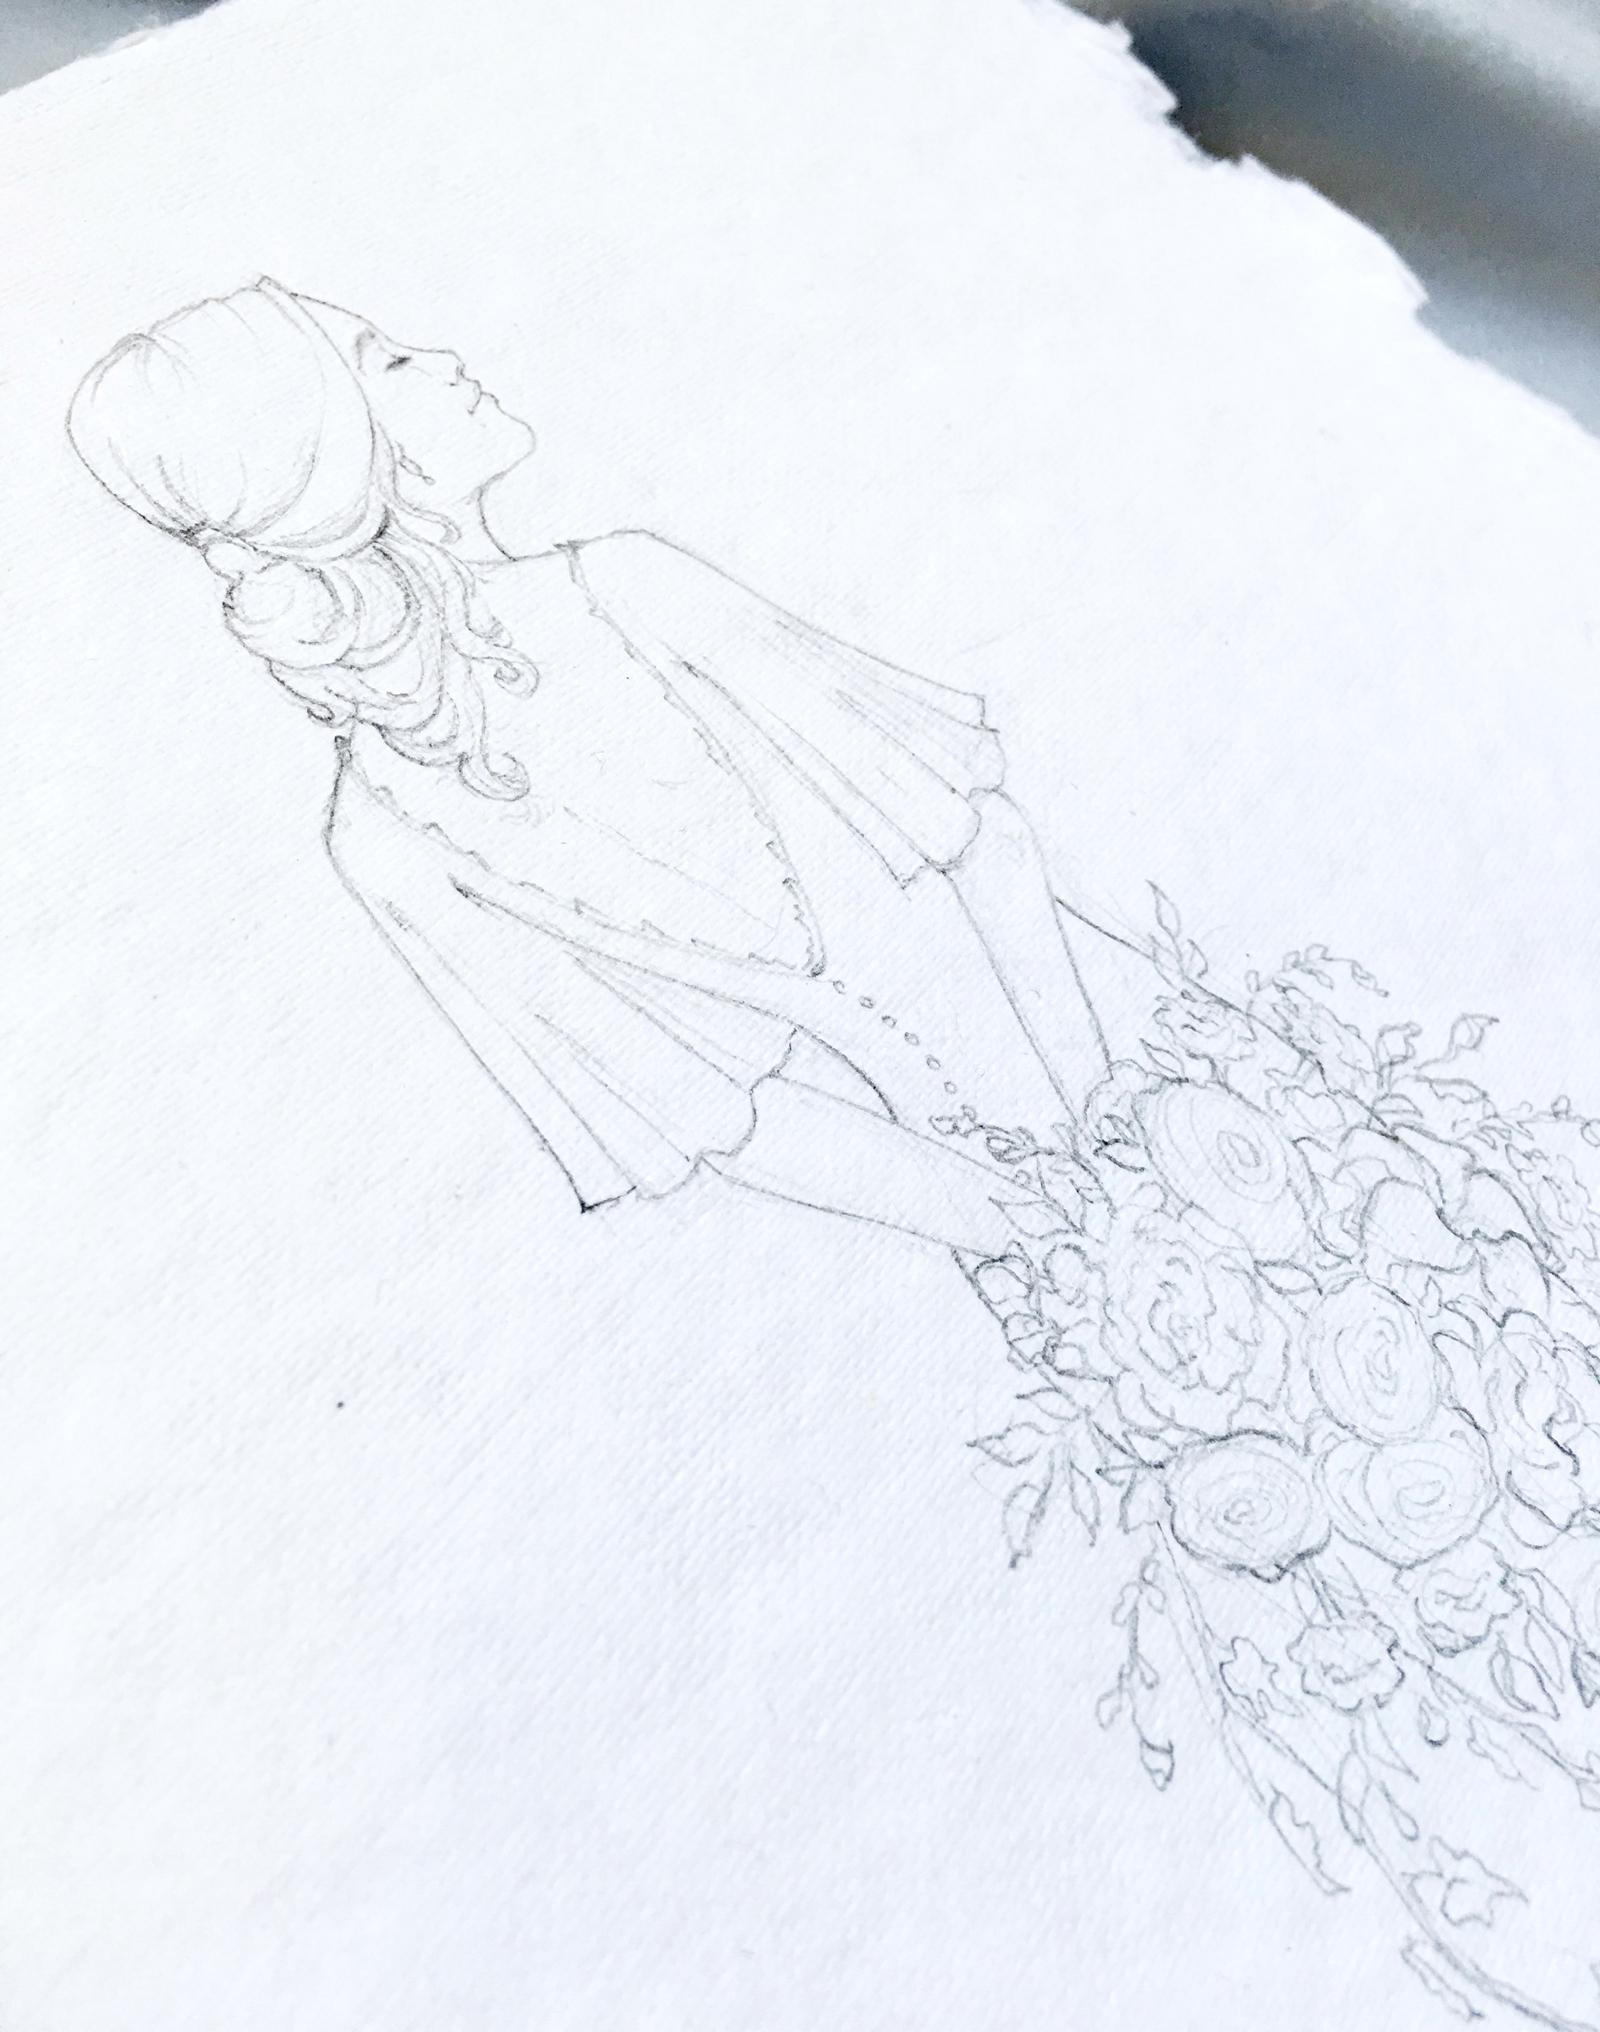 Custom bridal portrait sketch. Fine art bridal portrait on handmade paper. #customportrait #portraitillustration #blusheddesign